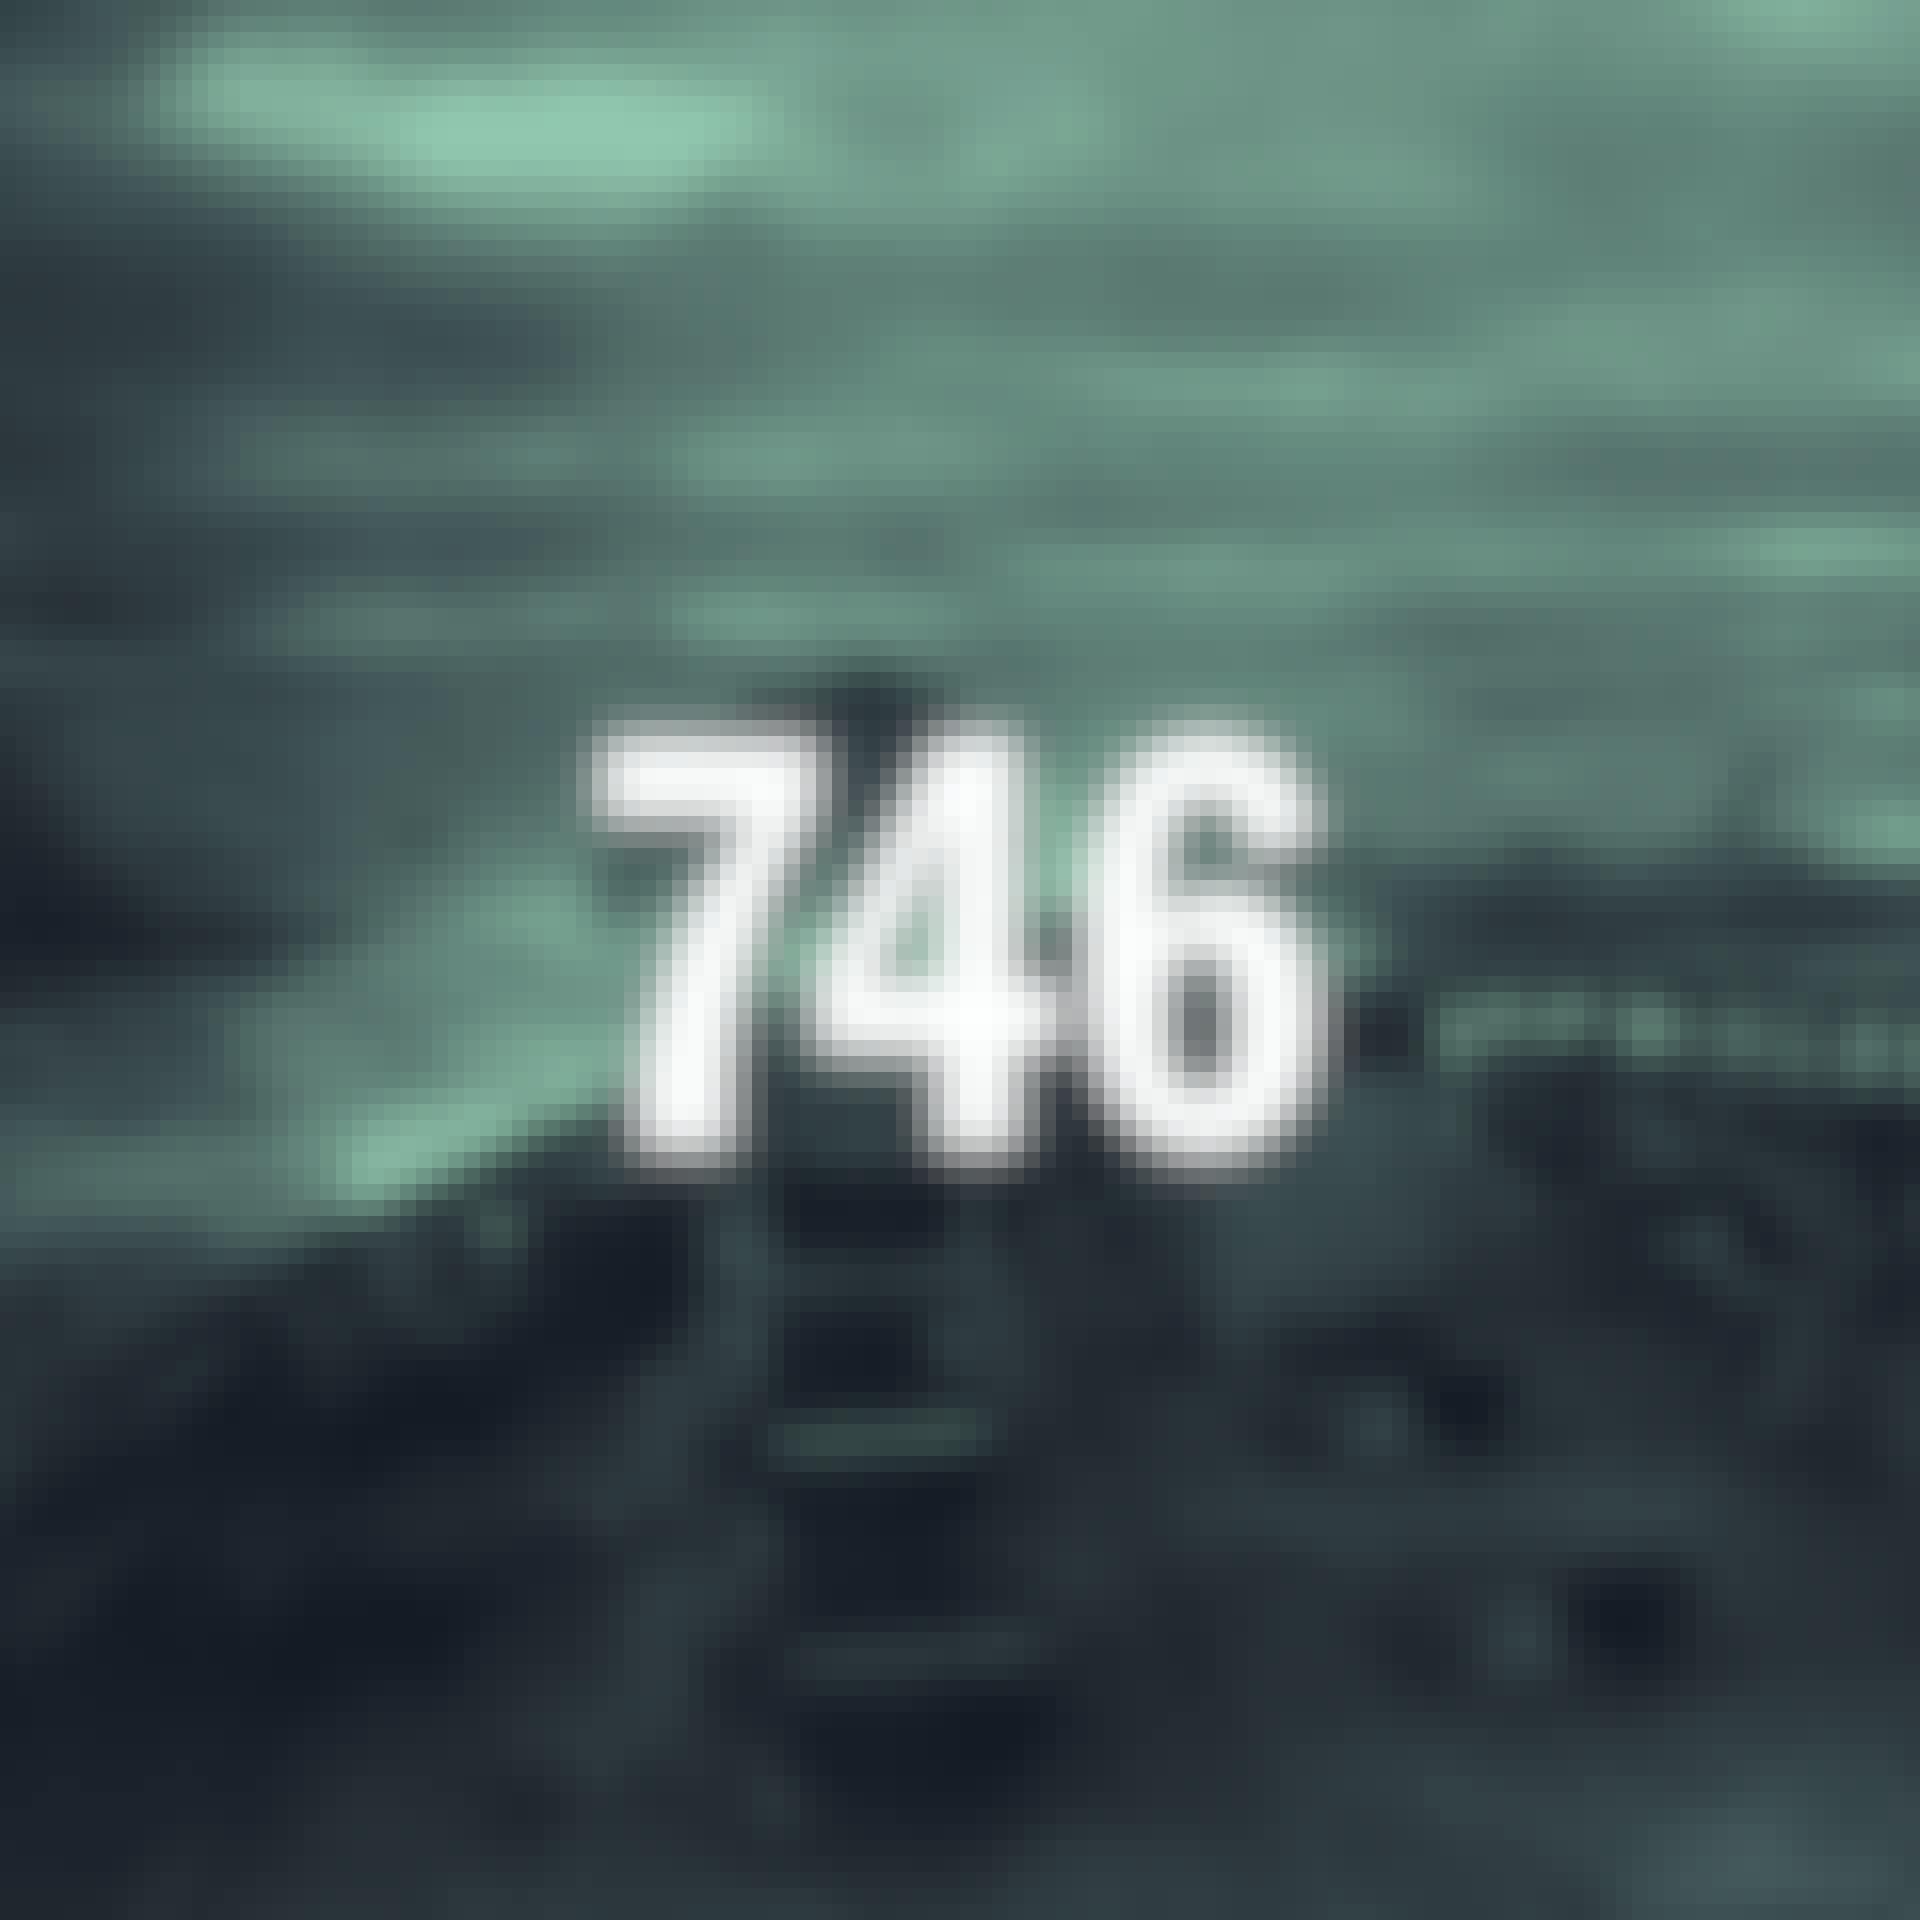 Tyske ubåde tab 2. verdenskrig